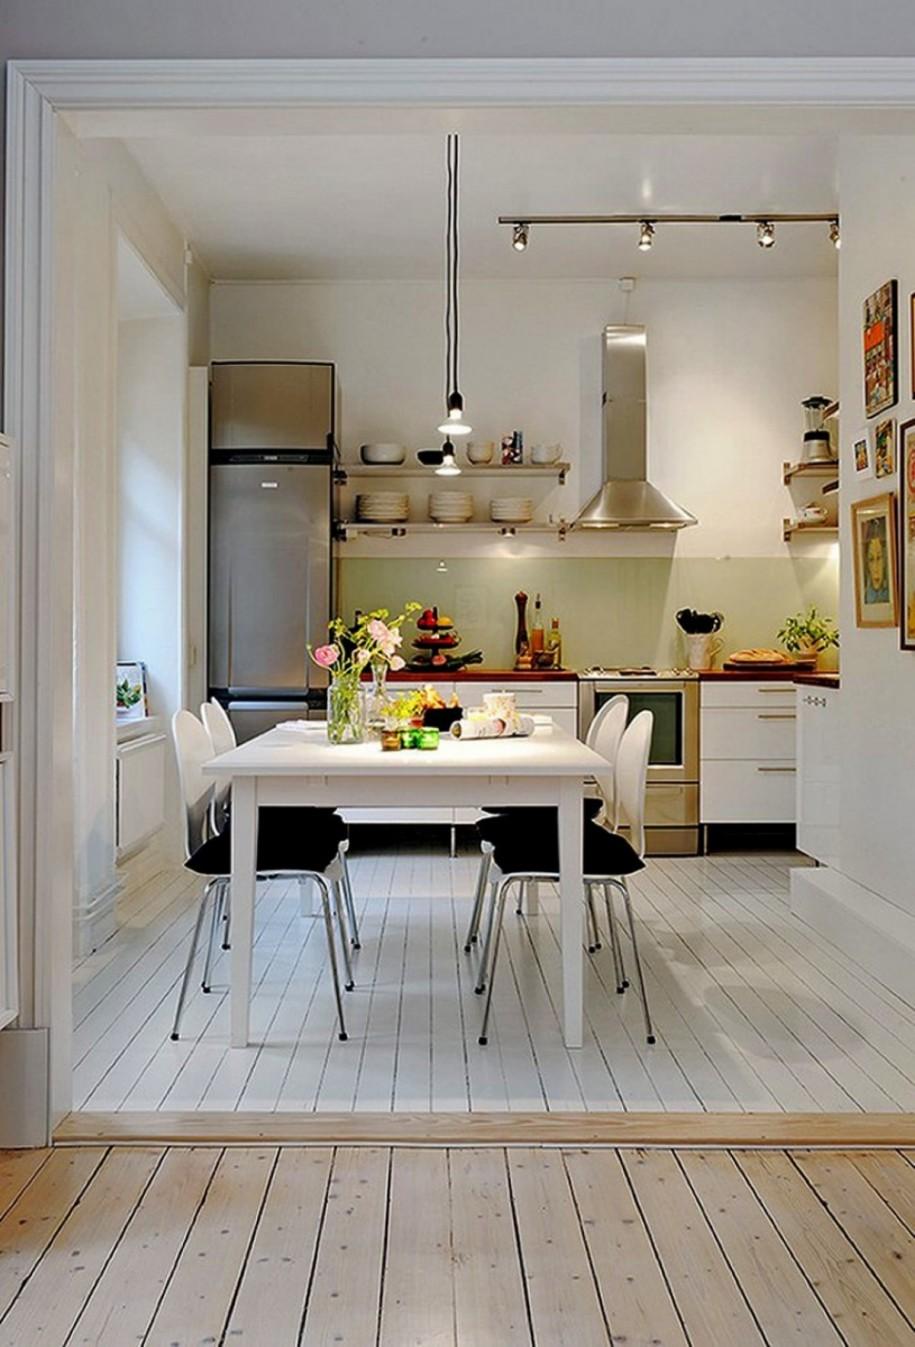 Small kitchen design ideas and flooring